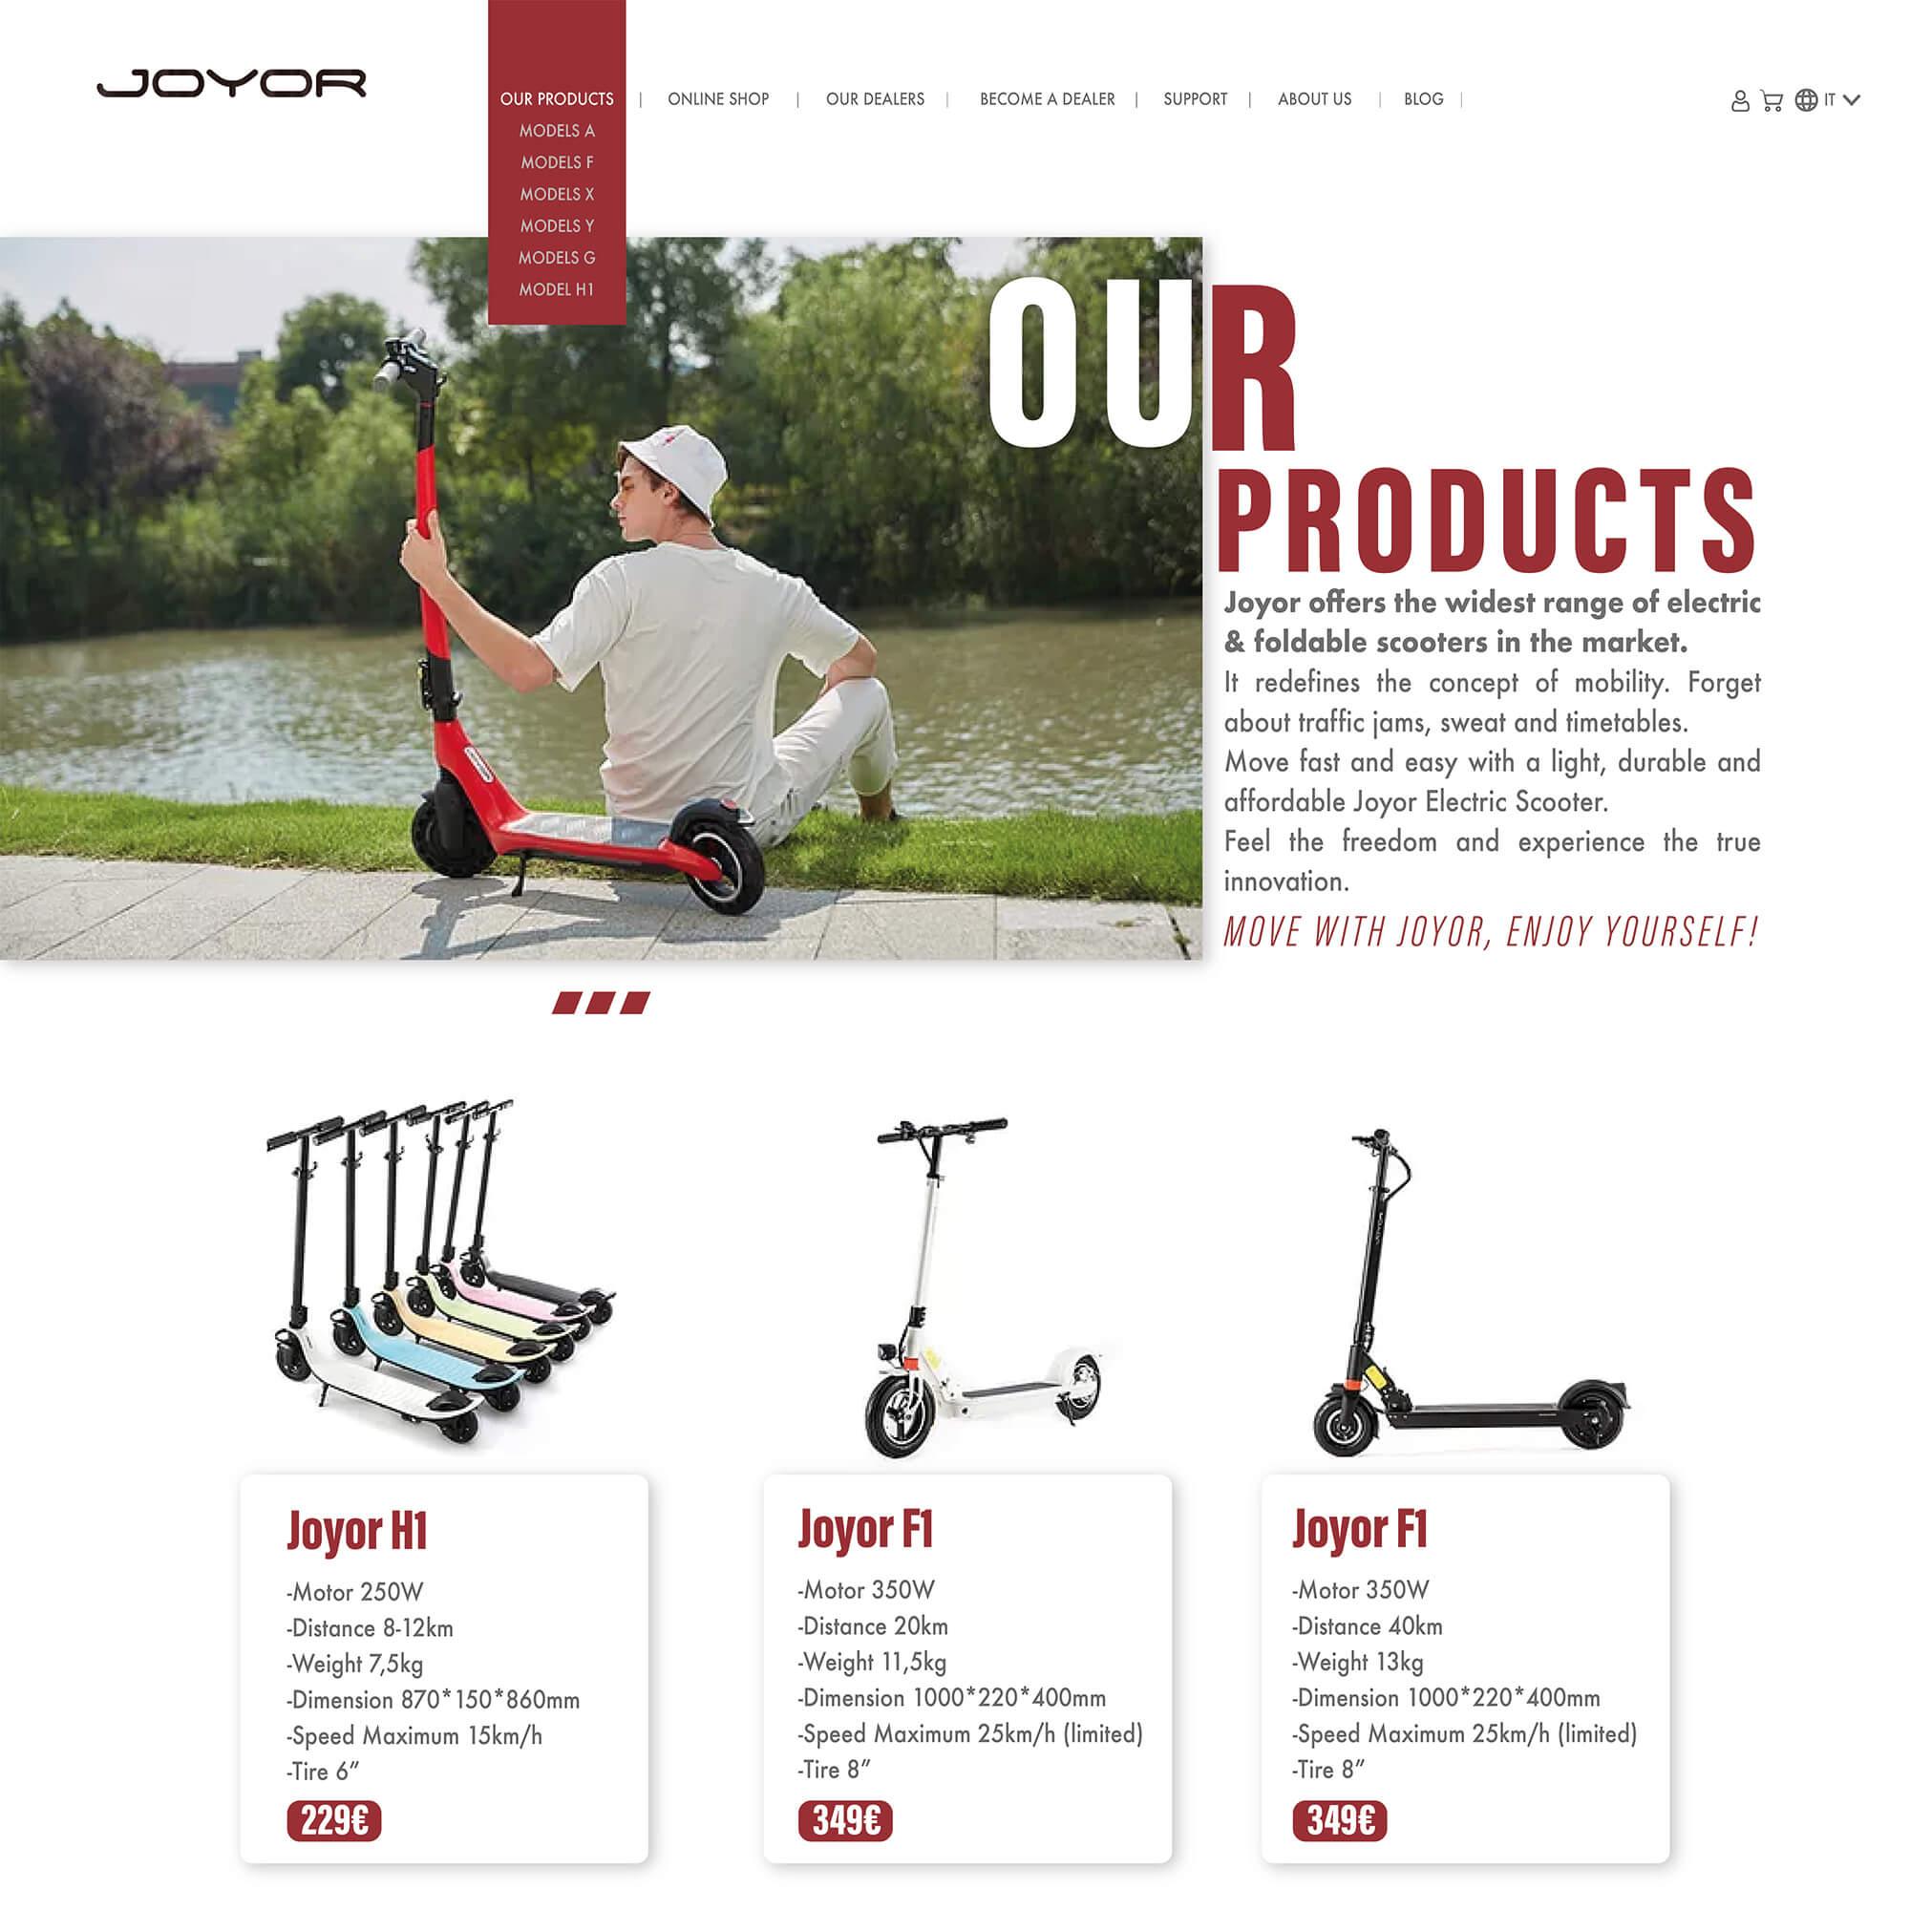 JOYOR-models